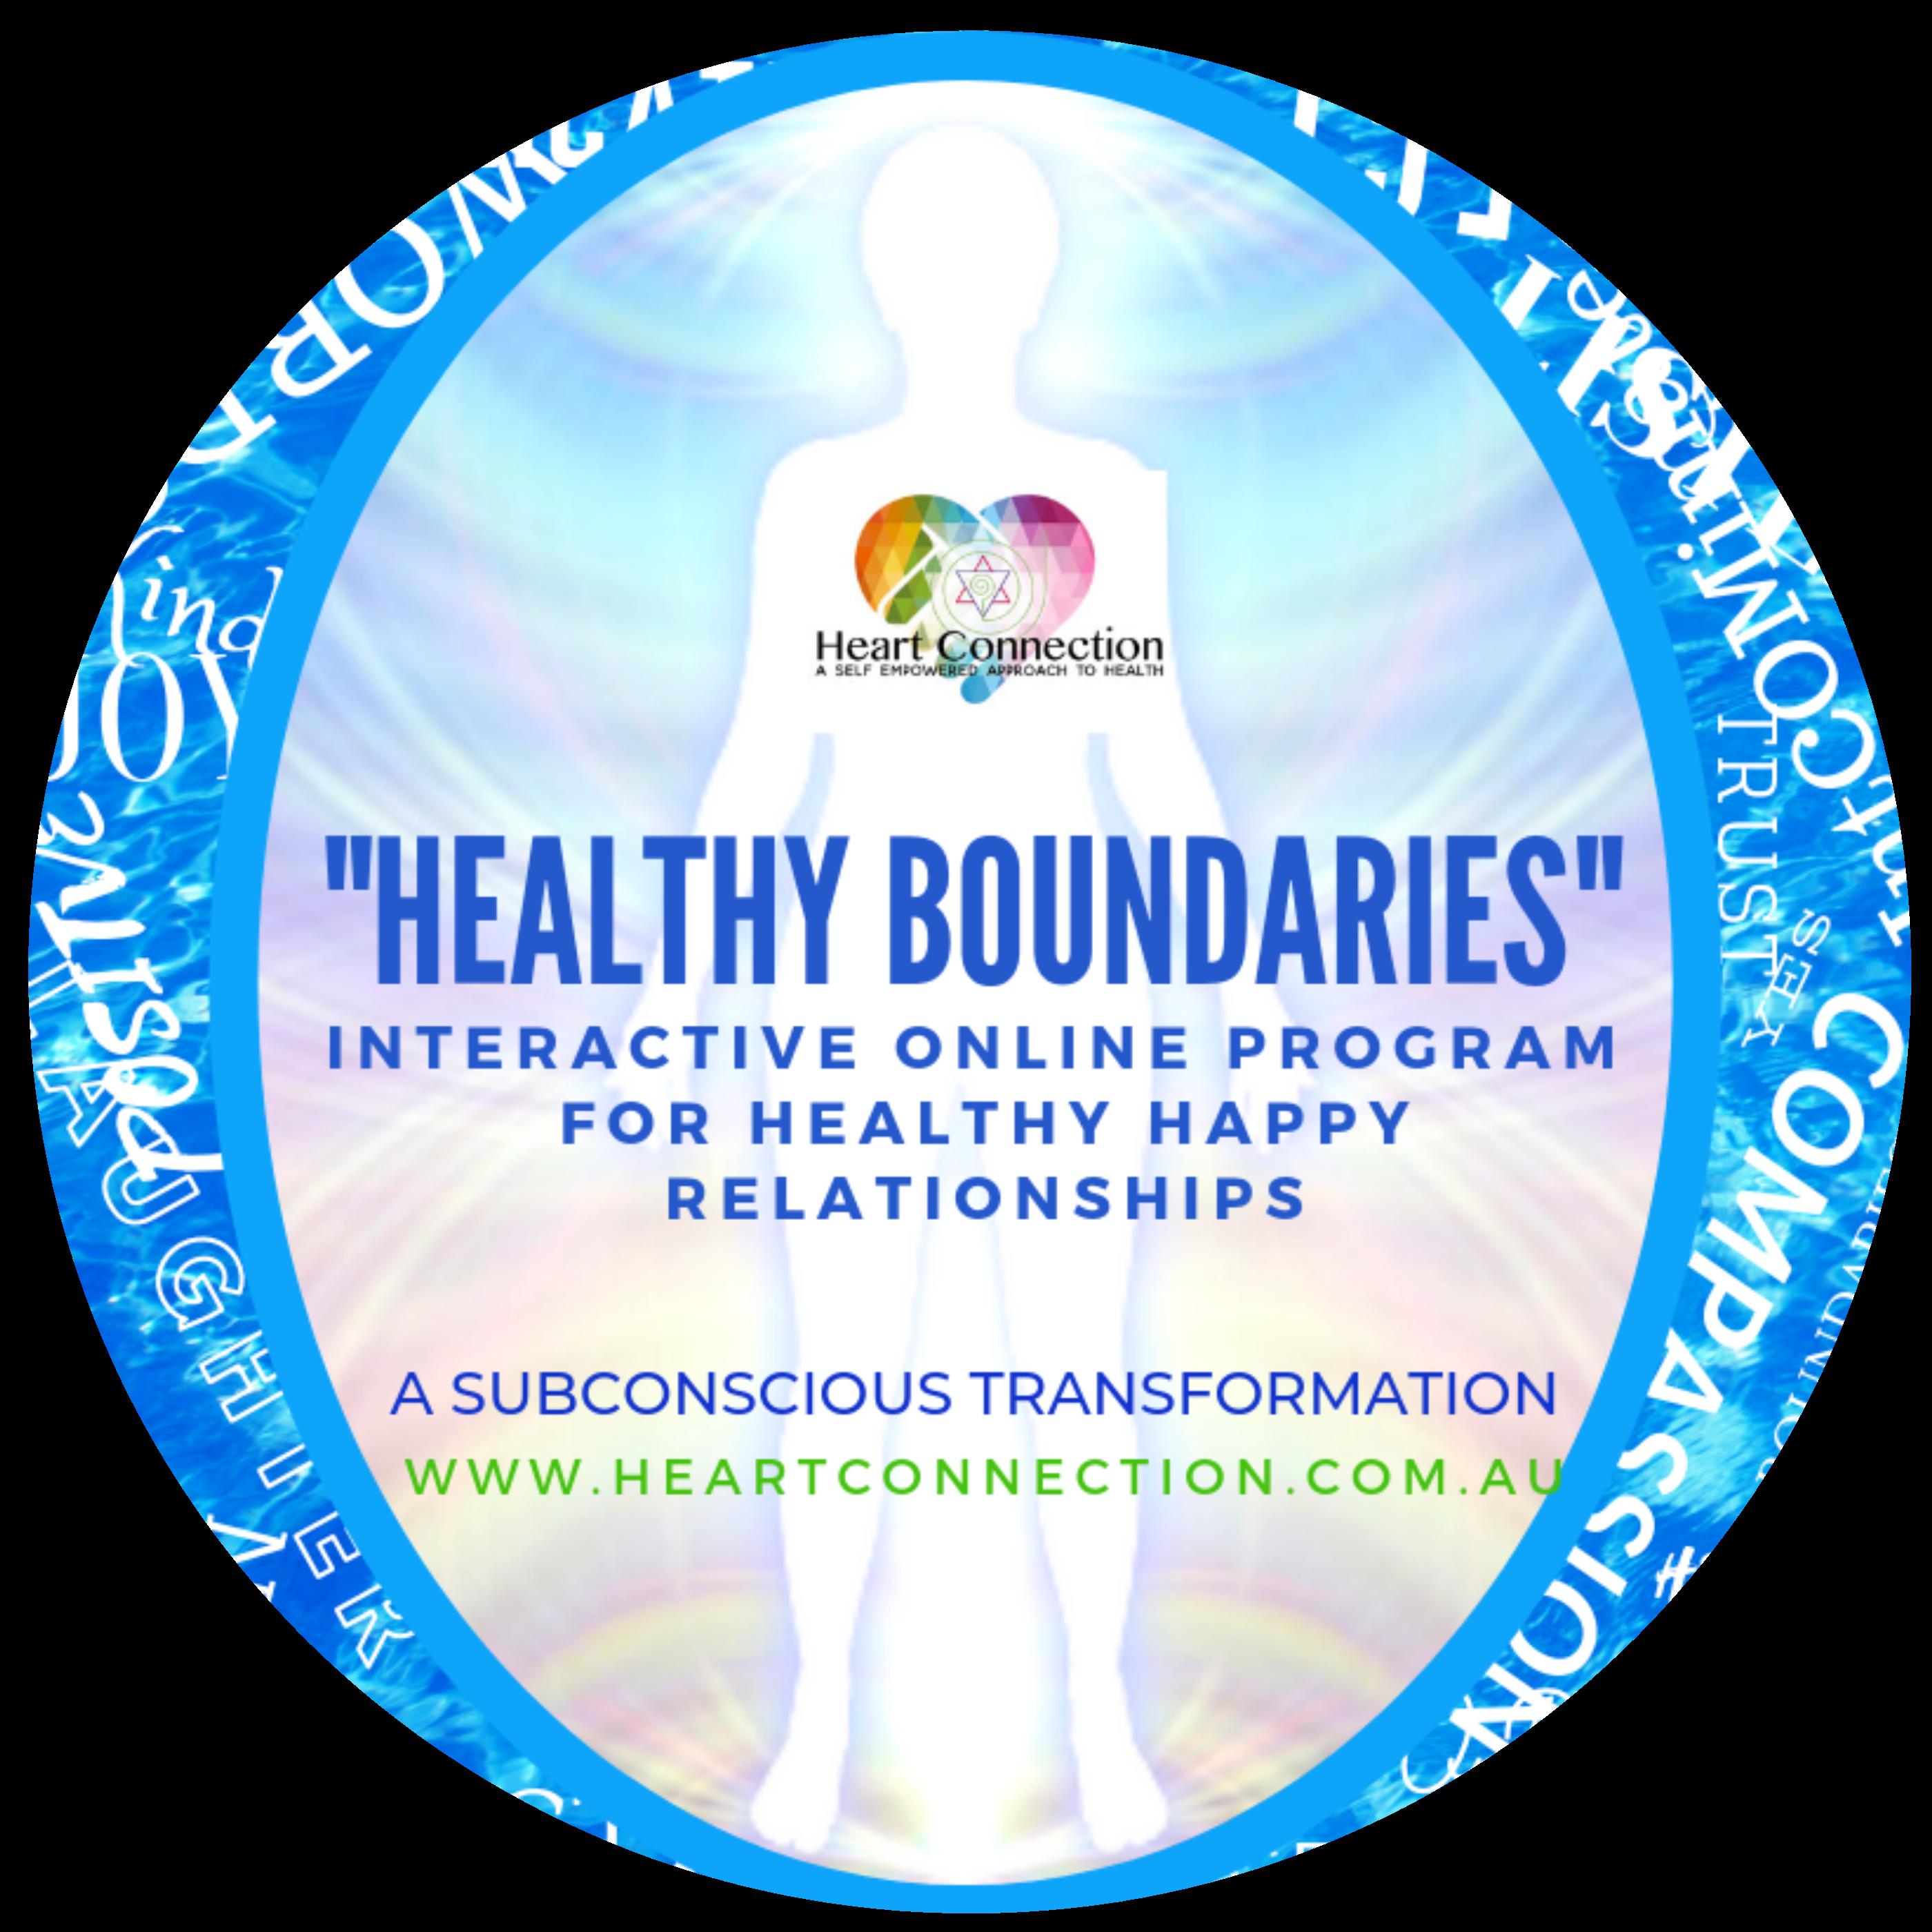 HEALTHY BOUNDARIES HEALTHY HAPPY RELATIONSHIPS